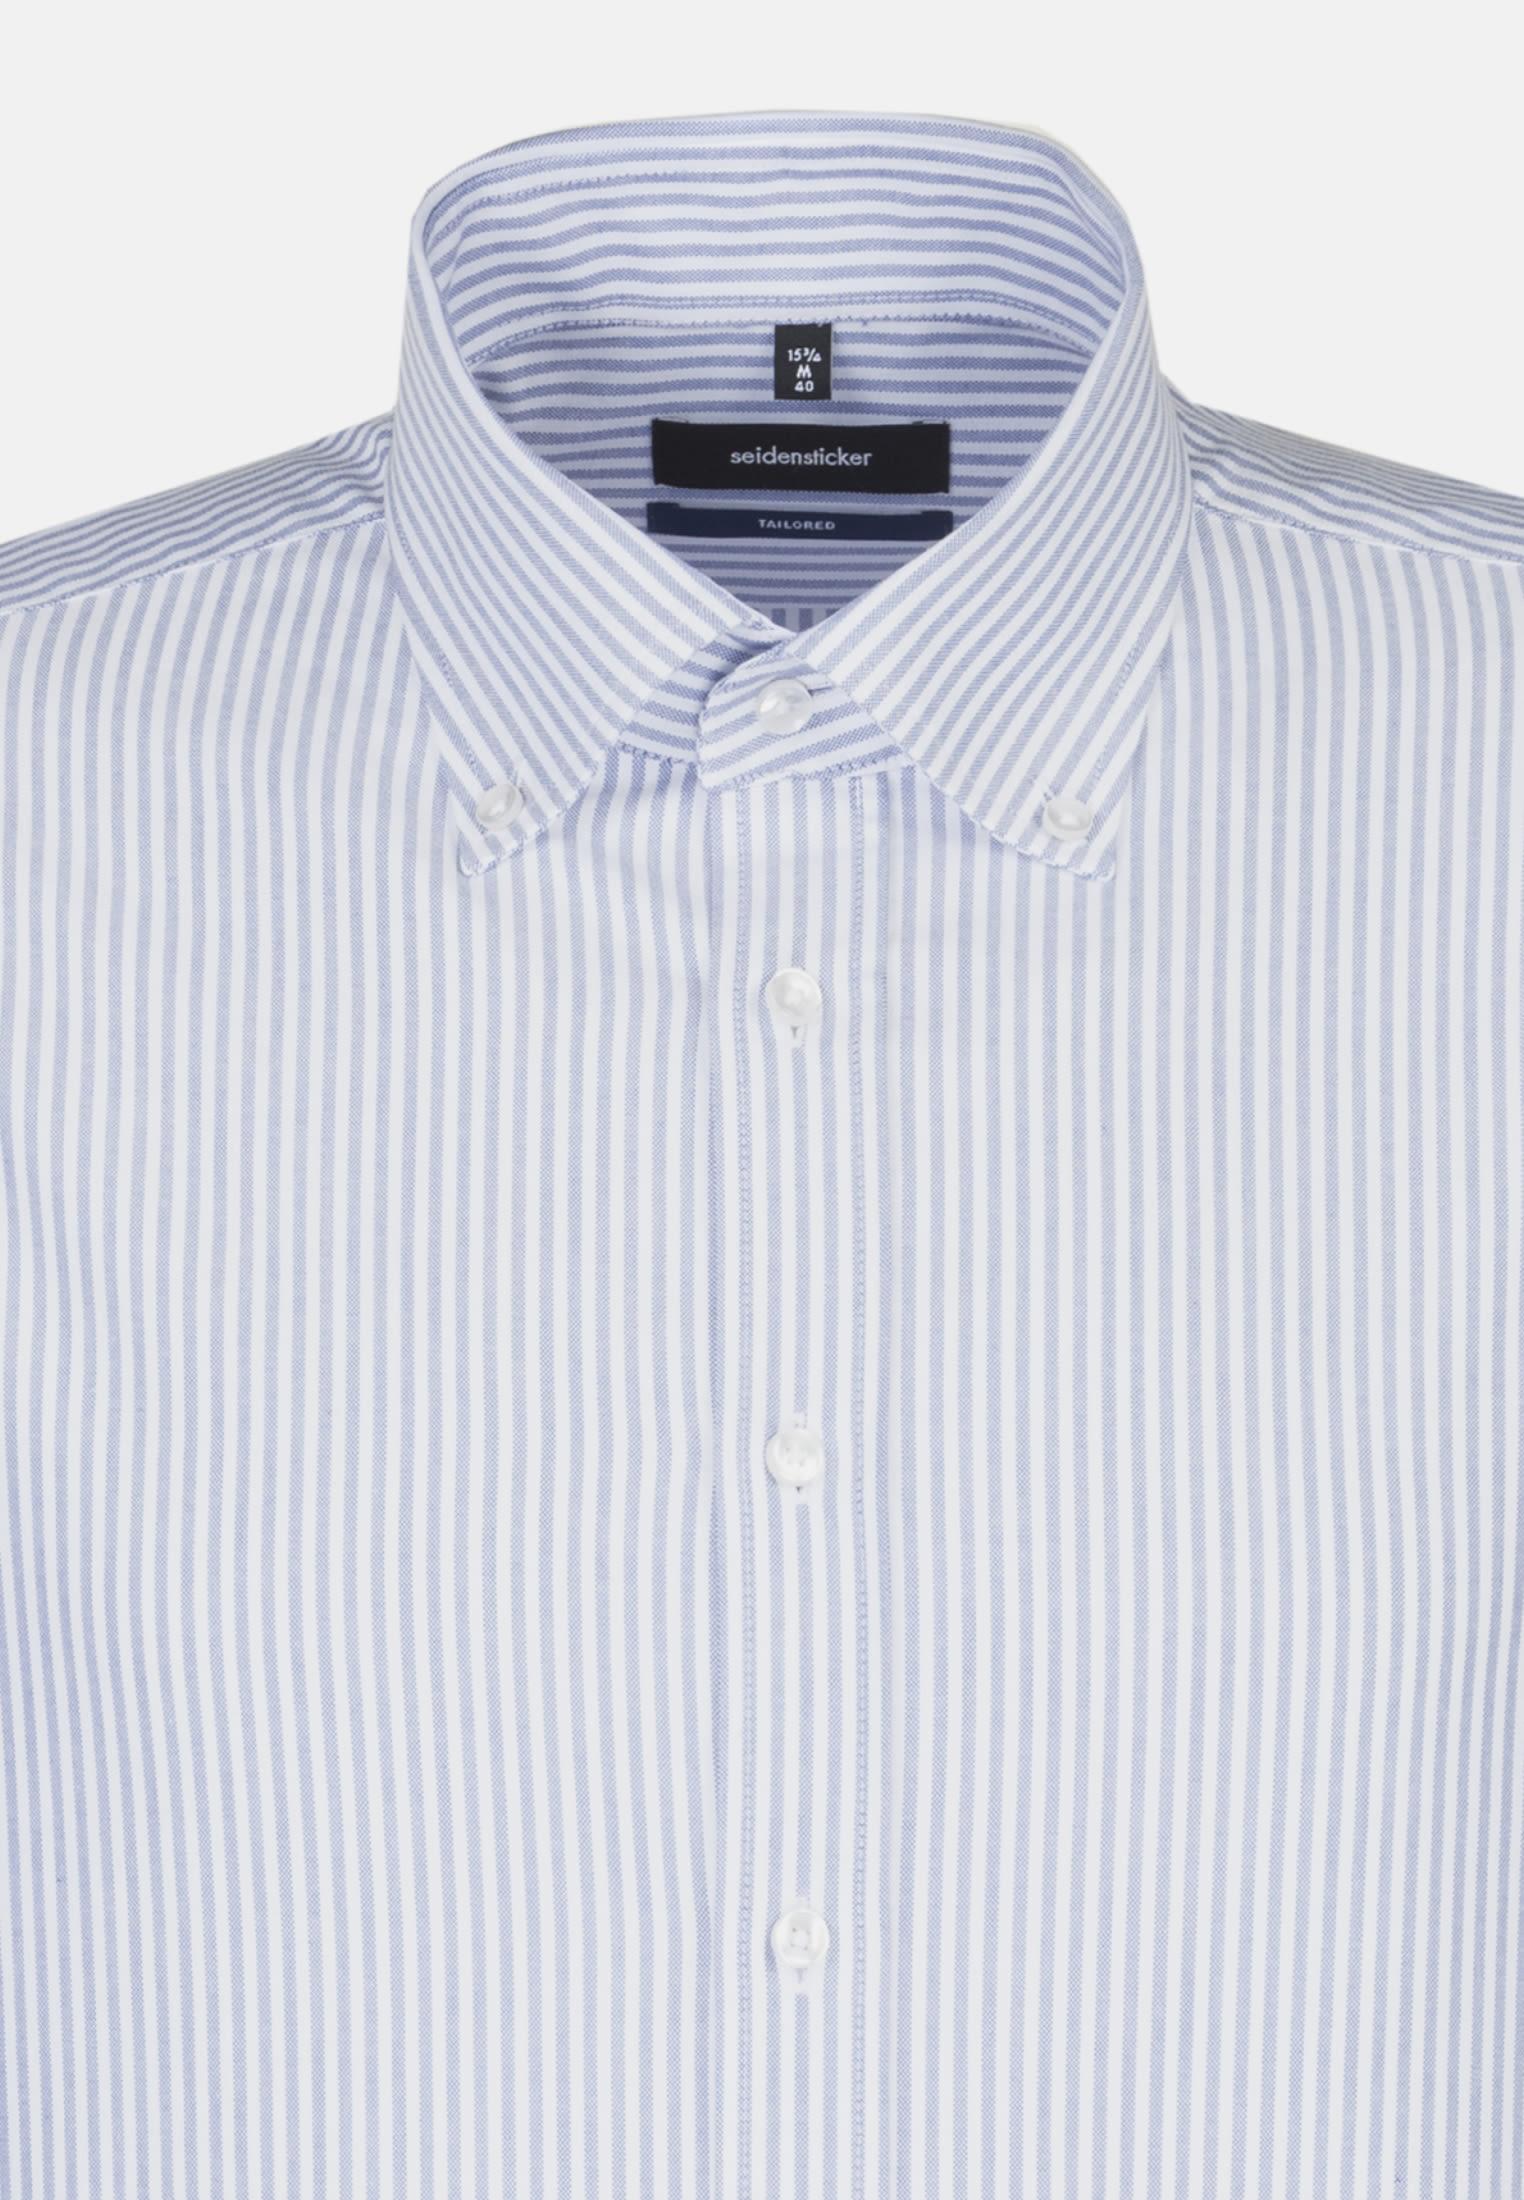 Easy-iron Oxford Business Shirt in Tailored with Button-Down-Collar in blau    Seidensticker Onlineshop